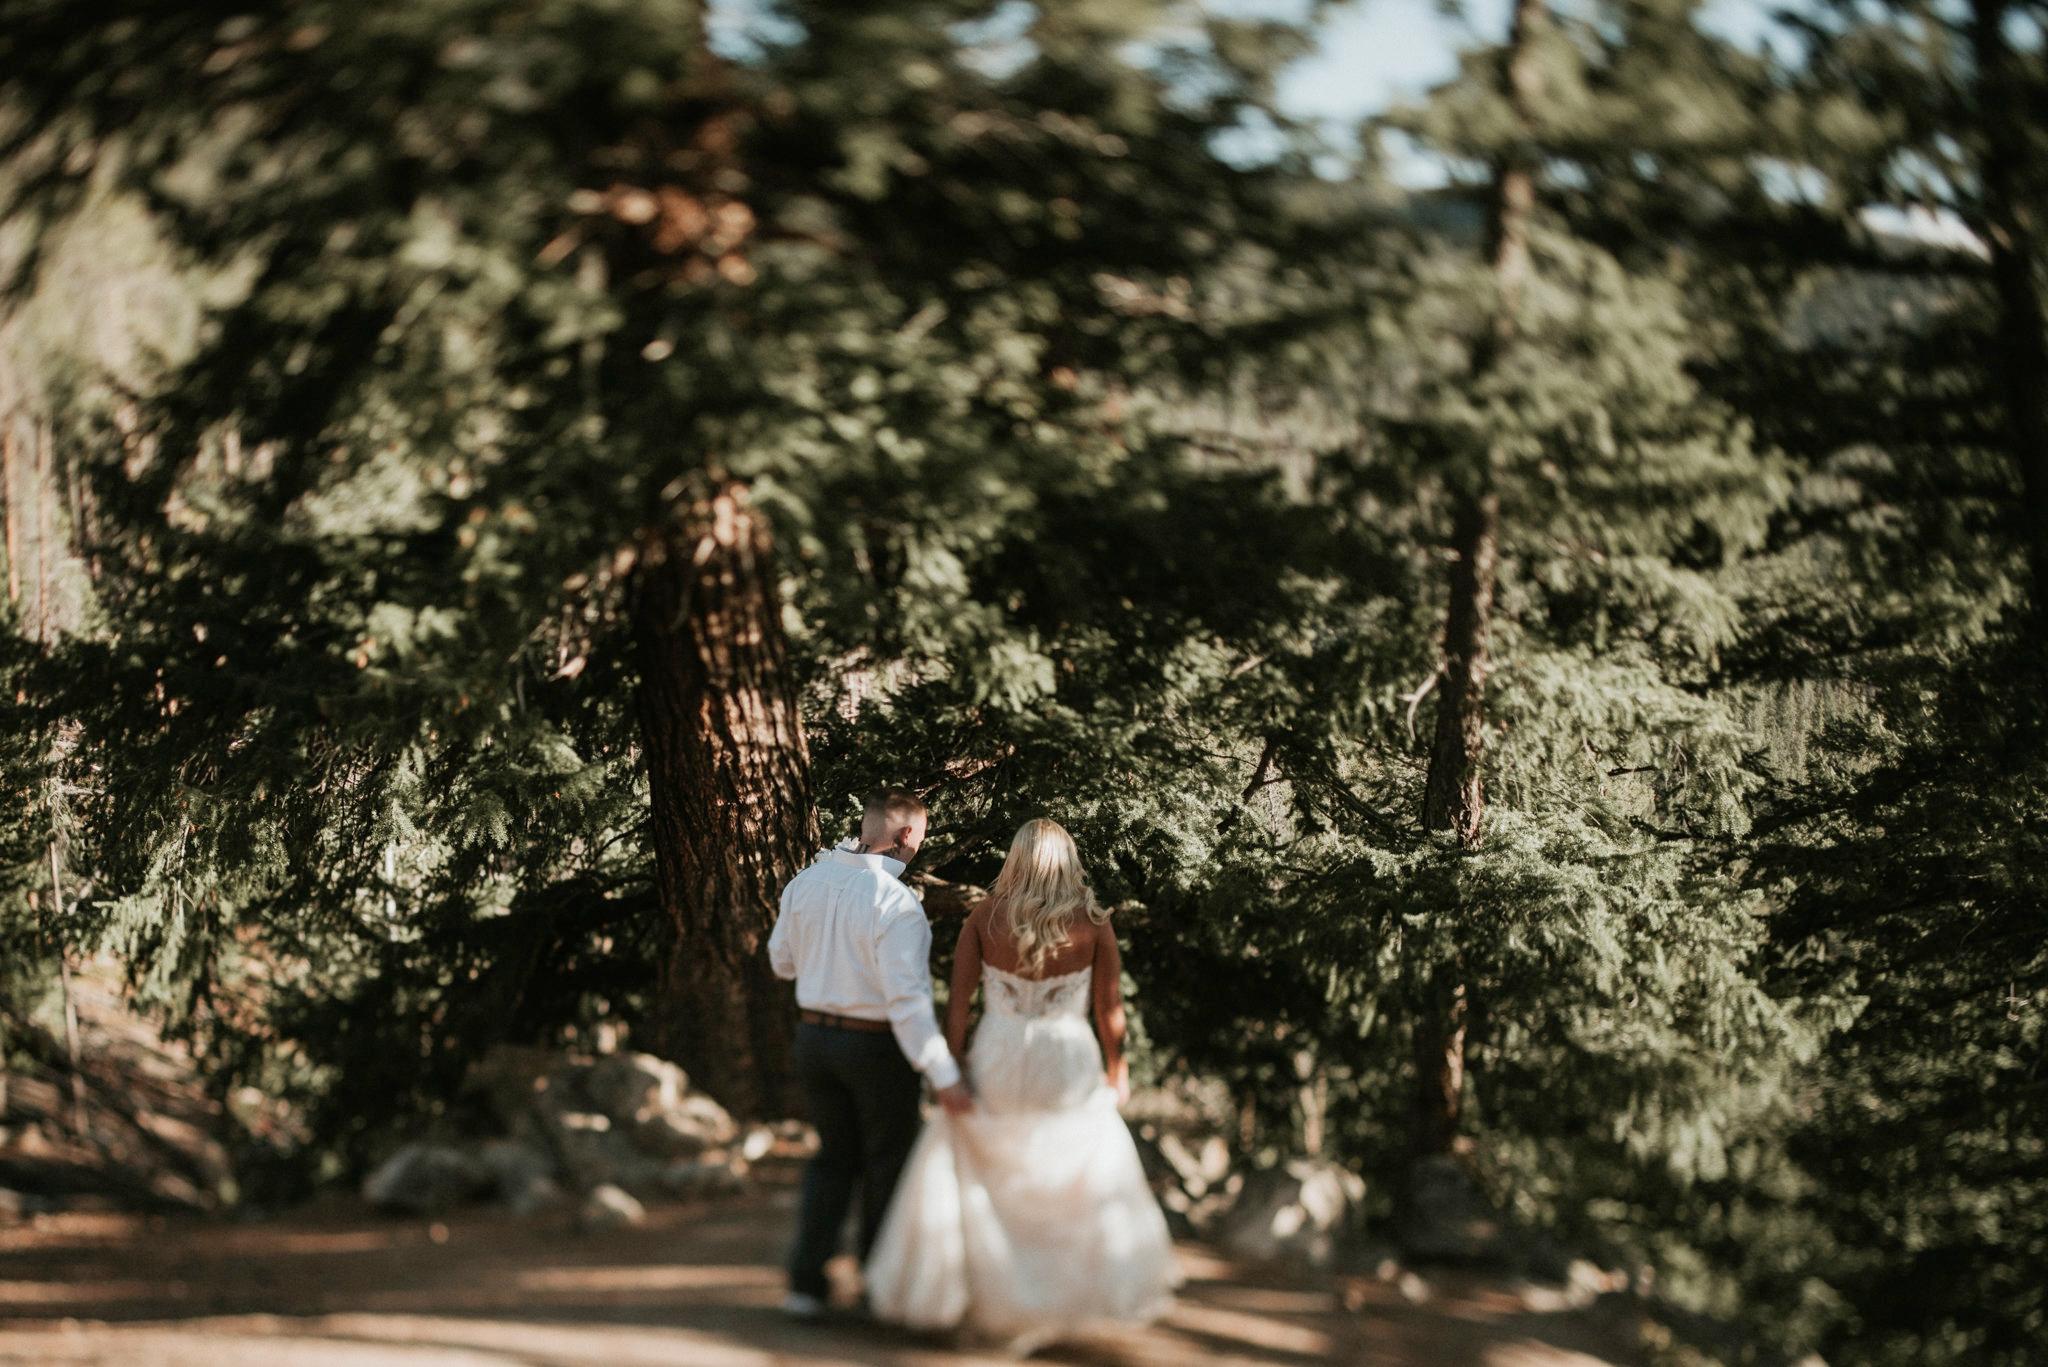 colorado elopement lake dillon sapphire point Zach&Rosalie St. Louis Wedding Photographer--49.jpg